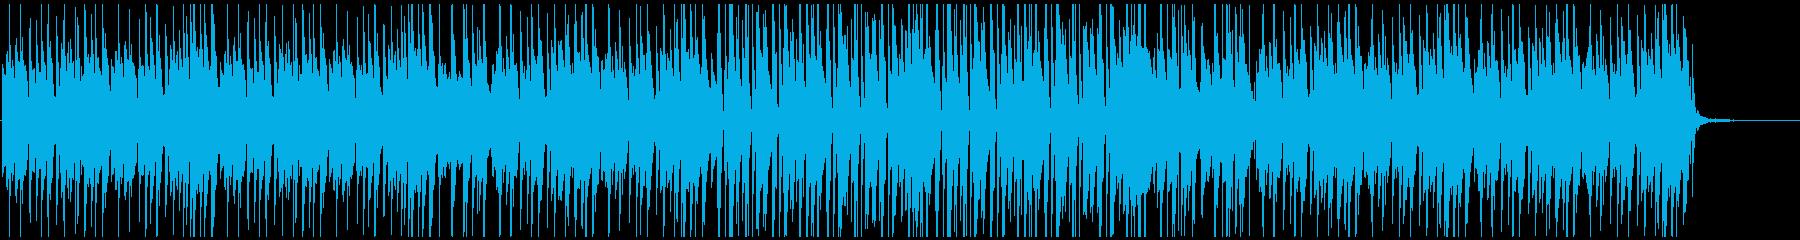 CMや映像にピアノ ゆったり心温まるの再生済みの波形